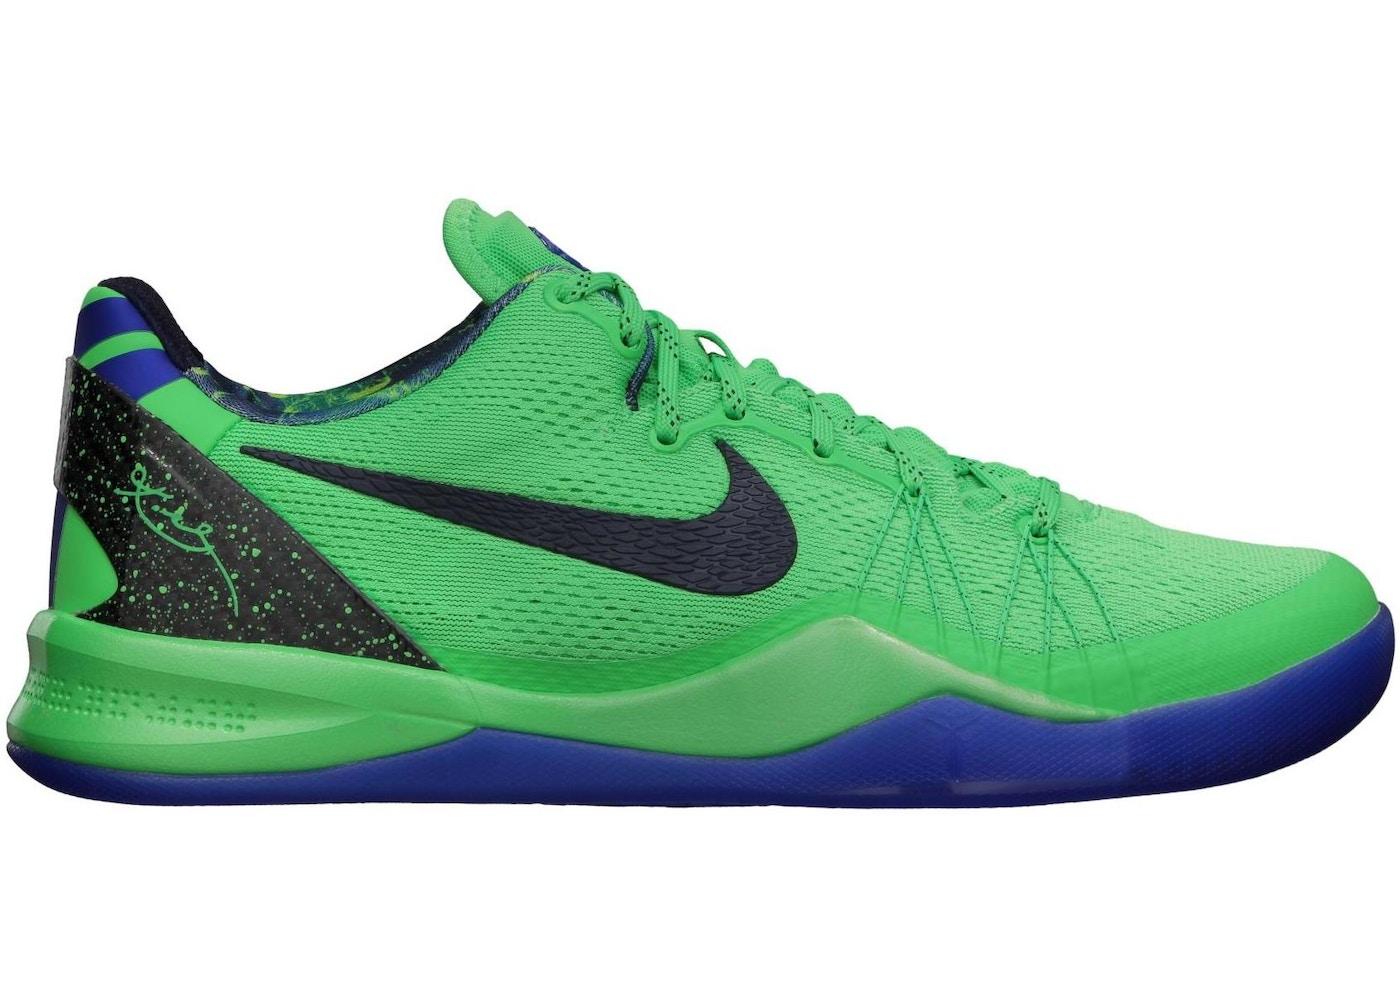 quality design 4cebb 698d3 Buy Nike Kobe 8 Shoes   Deadstock Sneakers